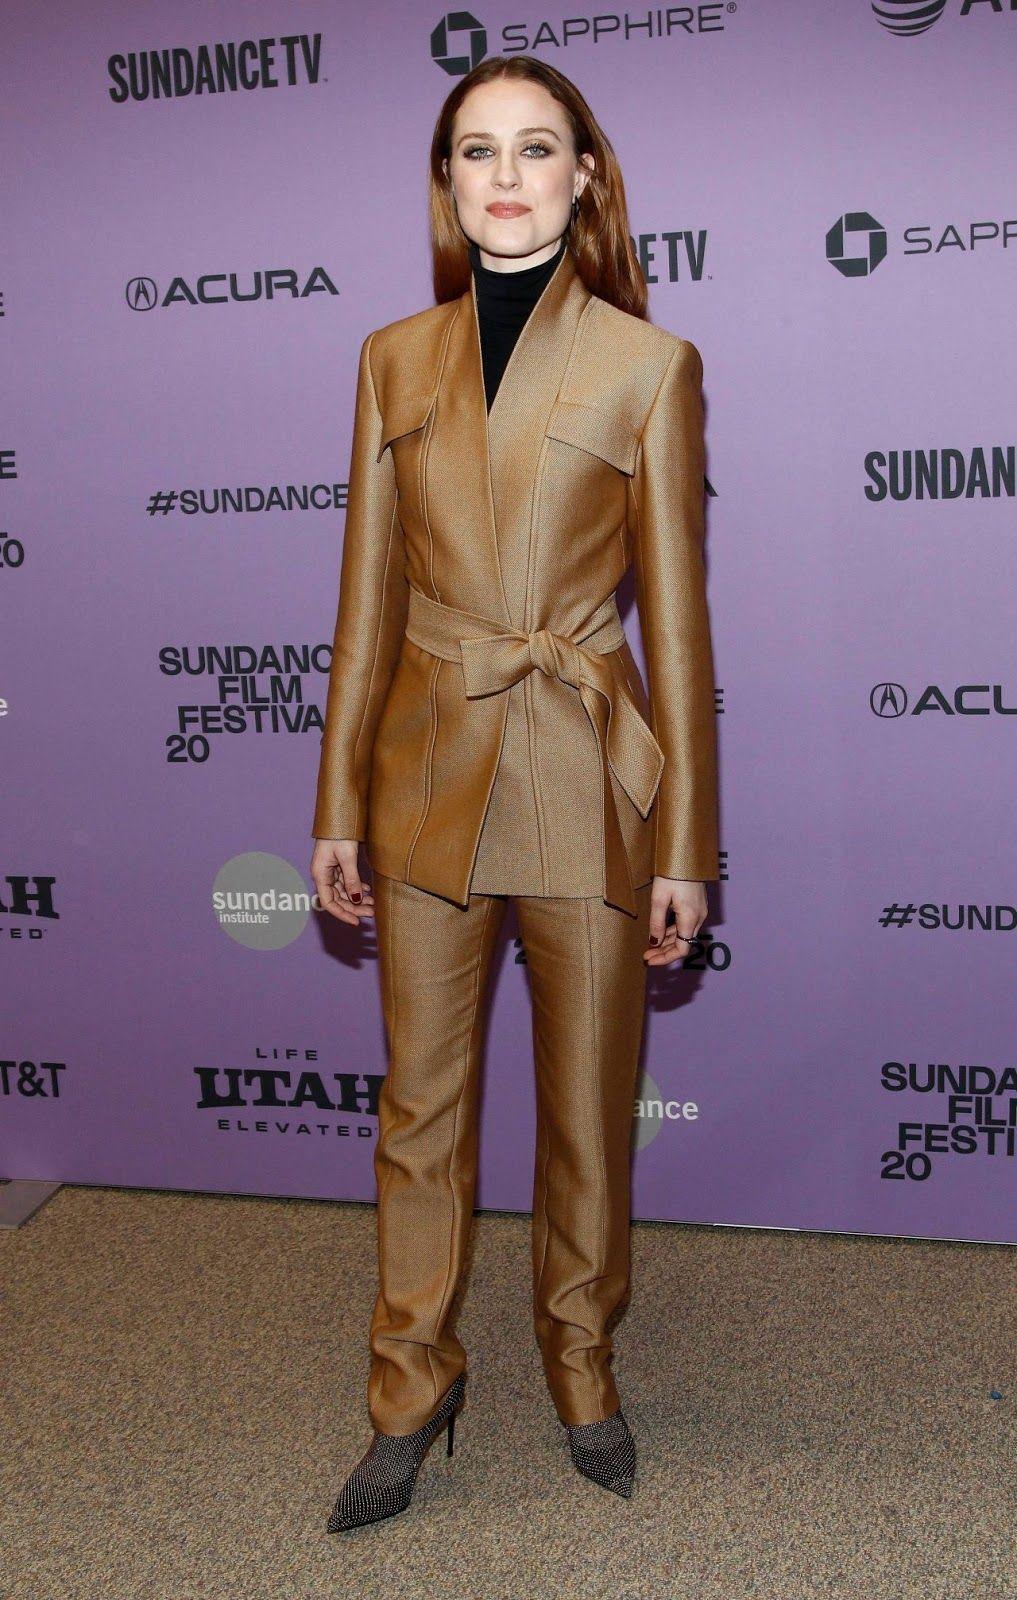 Evan Rachel Wood Wander Darkly Premiere At Sundance Film Festival In 2020 Evan Rachel Wood Sundance Film Festival Premiere